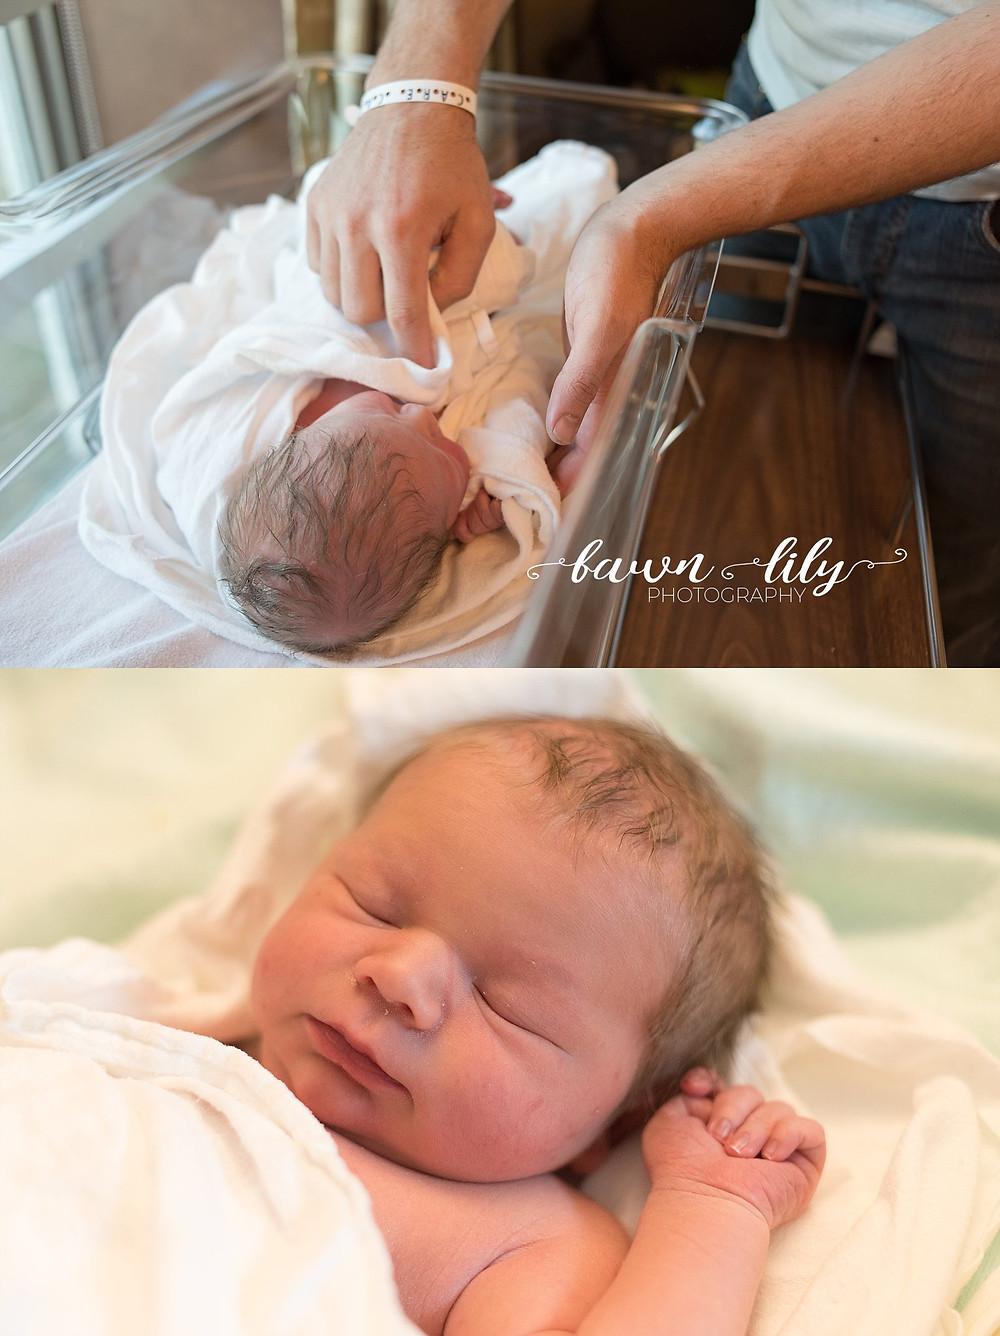 Newborn Baby in the Hospital Photos, Fresh 48, Hospital Newborn Photos Victoria BC Fawn Lily Photography